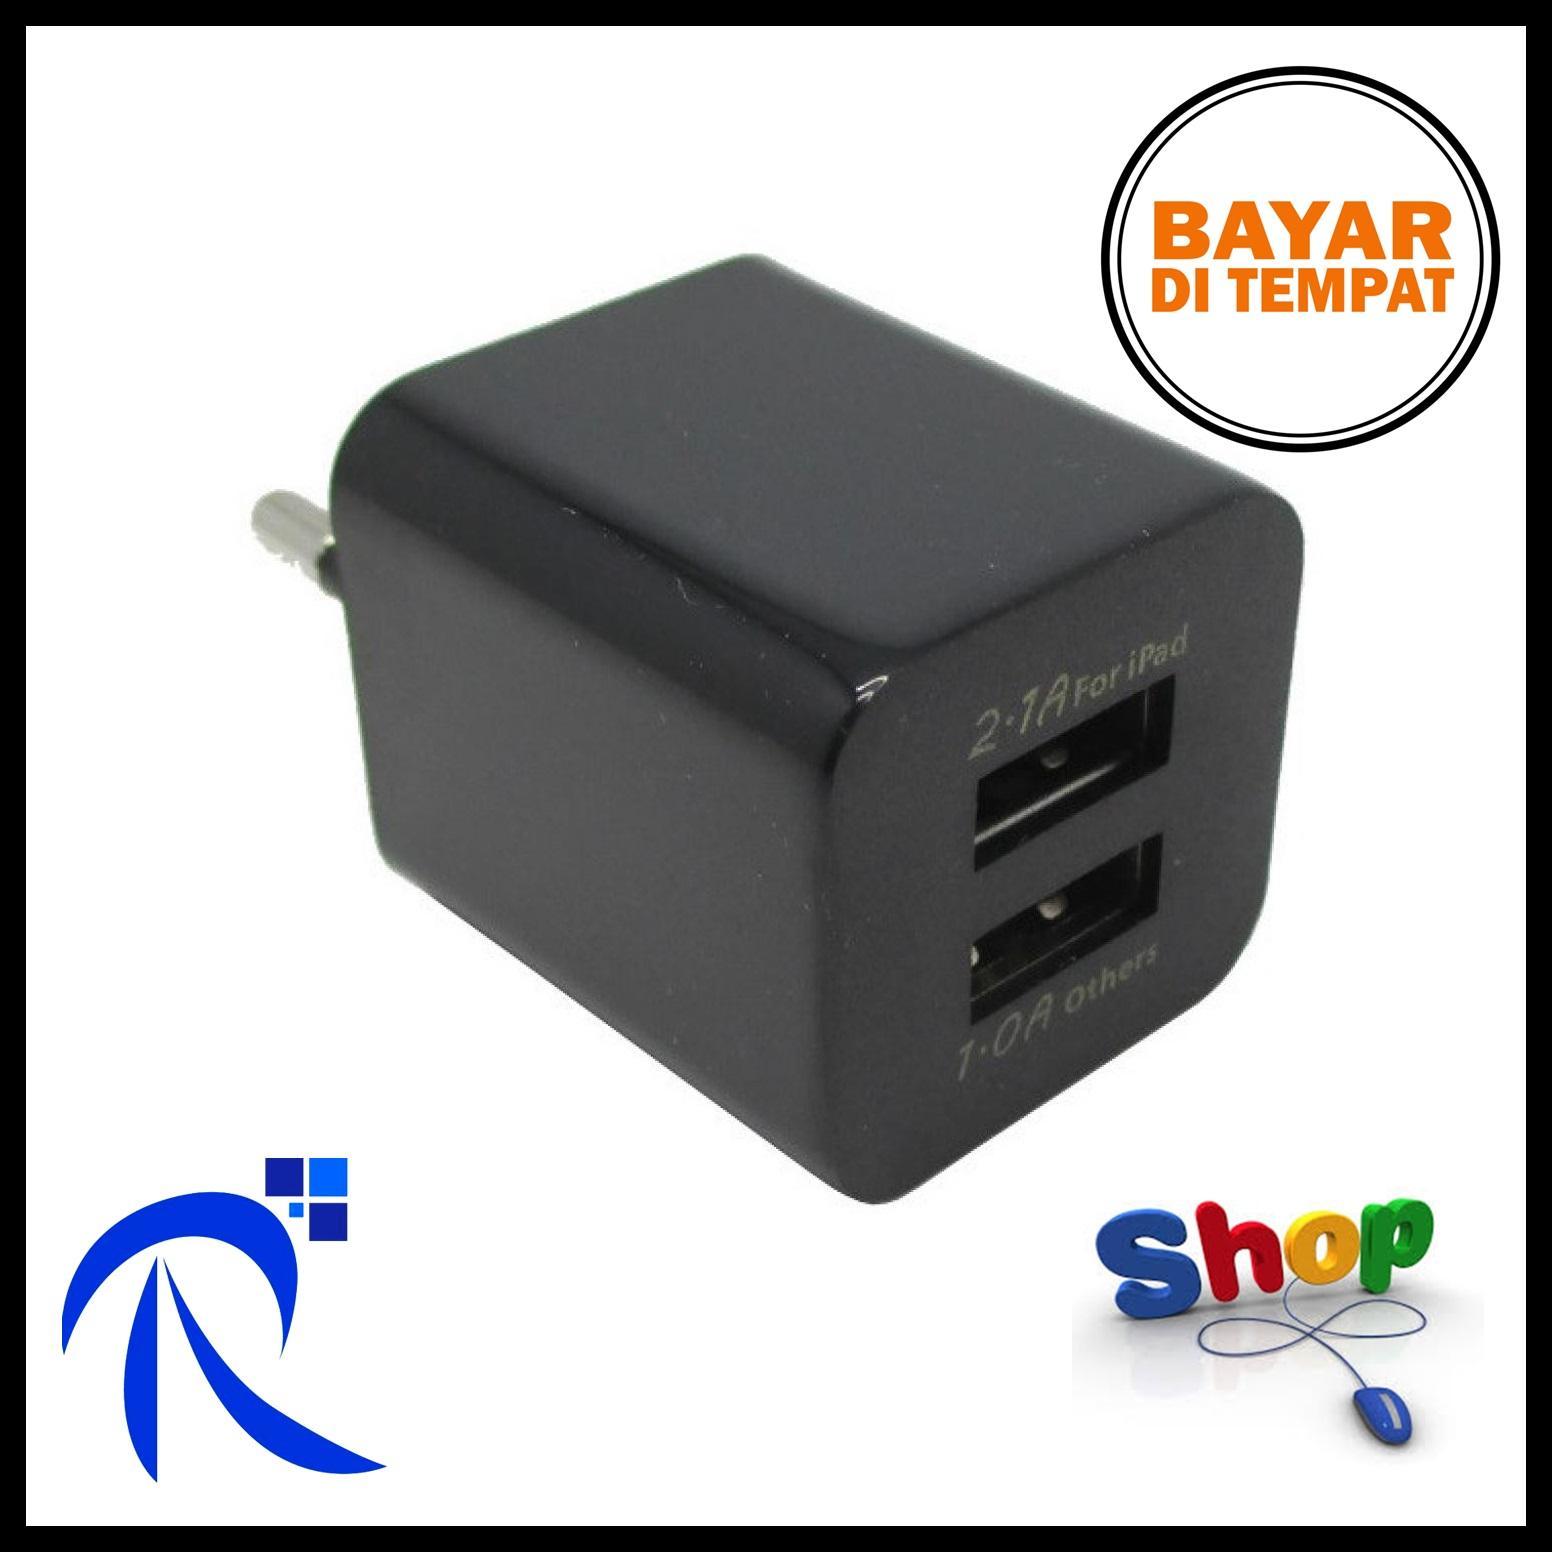 Rimas USB Charger 2 Port EU Plug - JBL1309 - White Putih / Black Hitam - Kepala Adapter Adaptor Cas